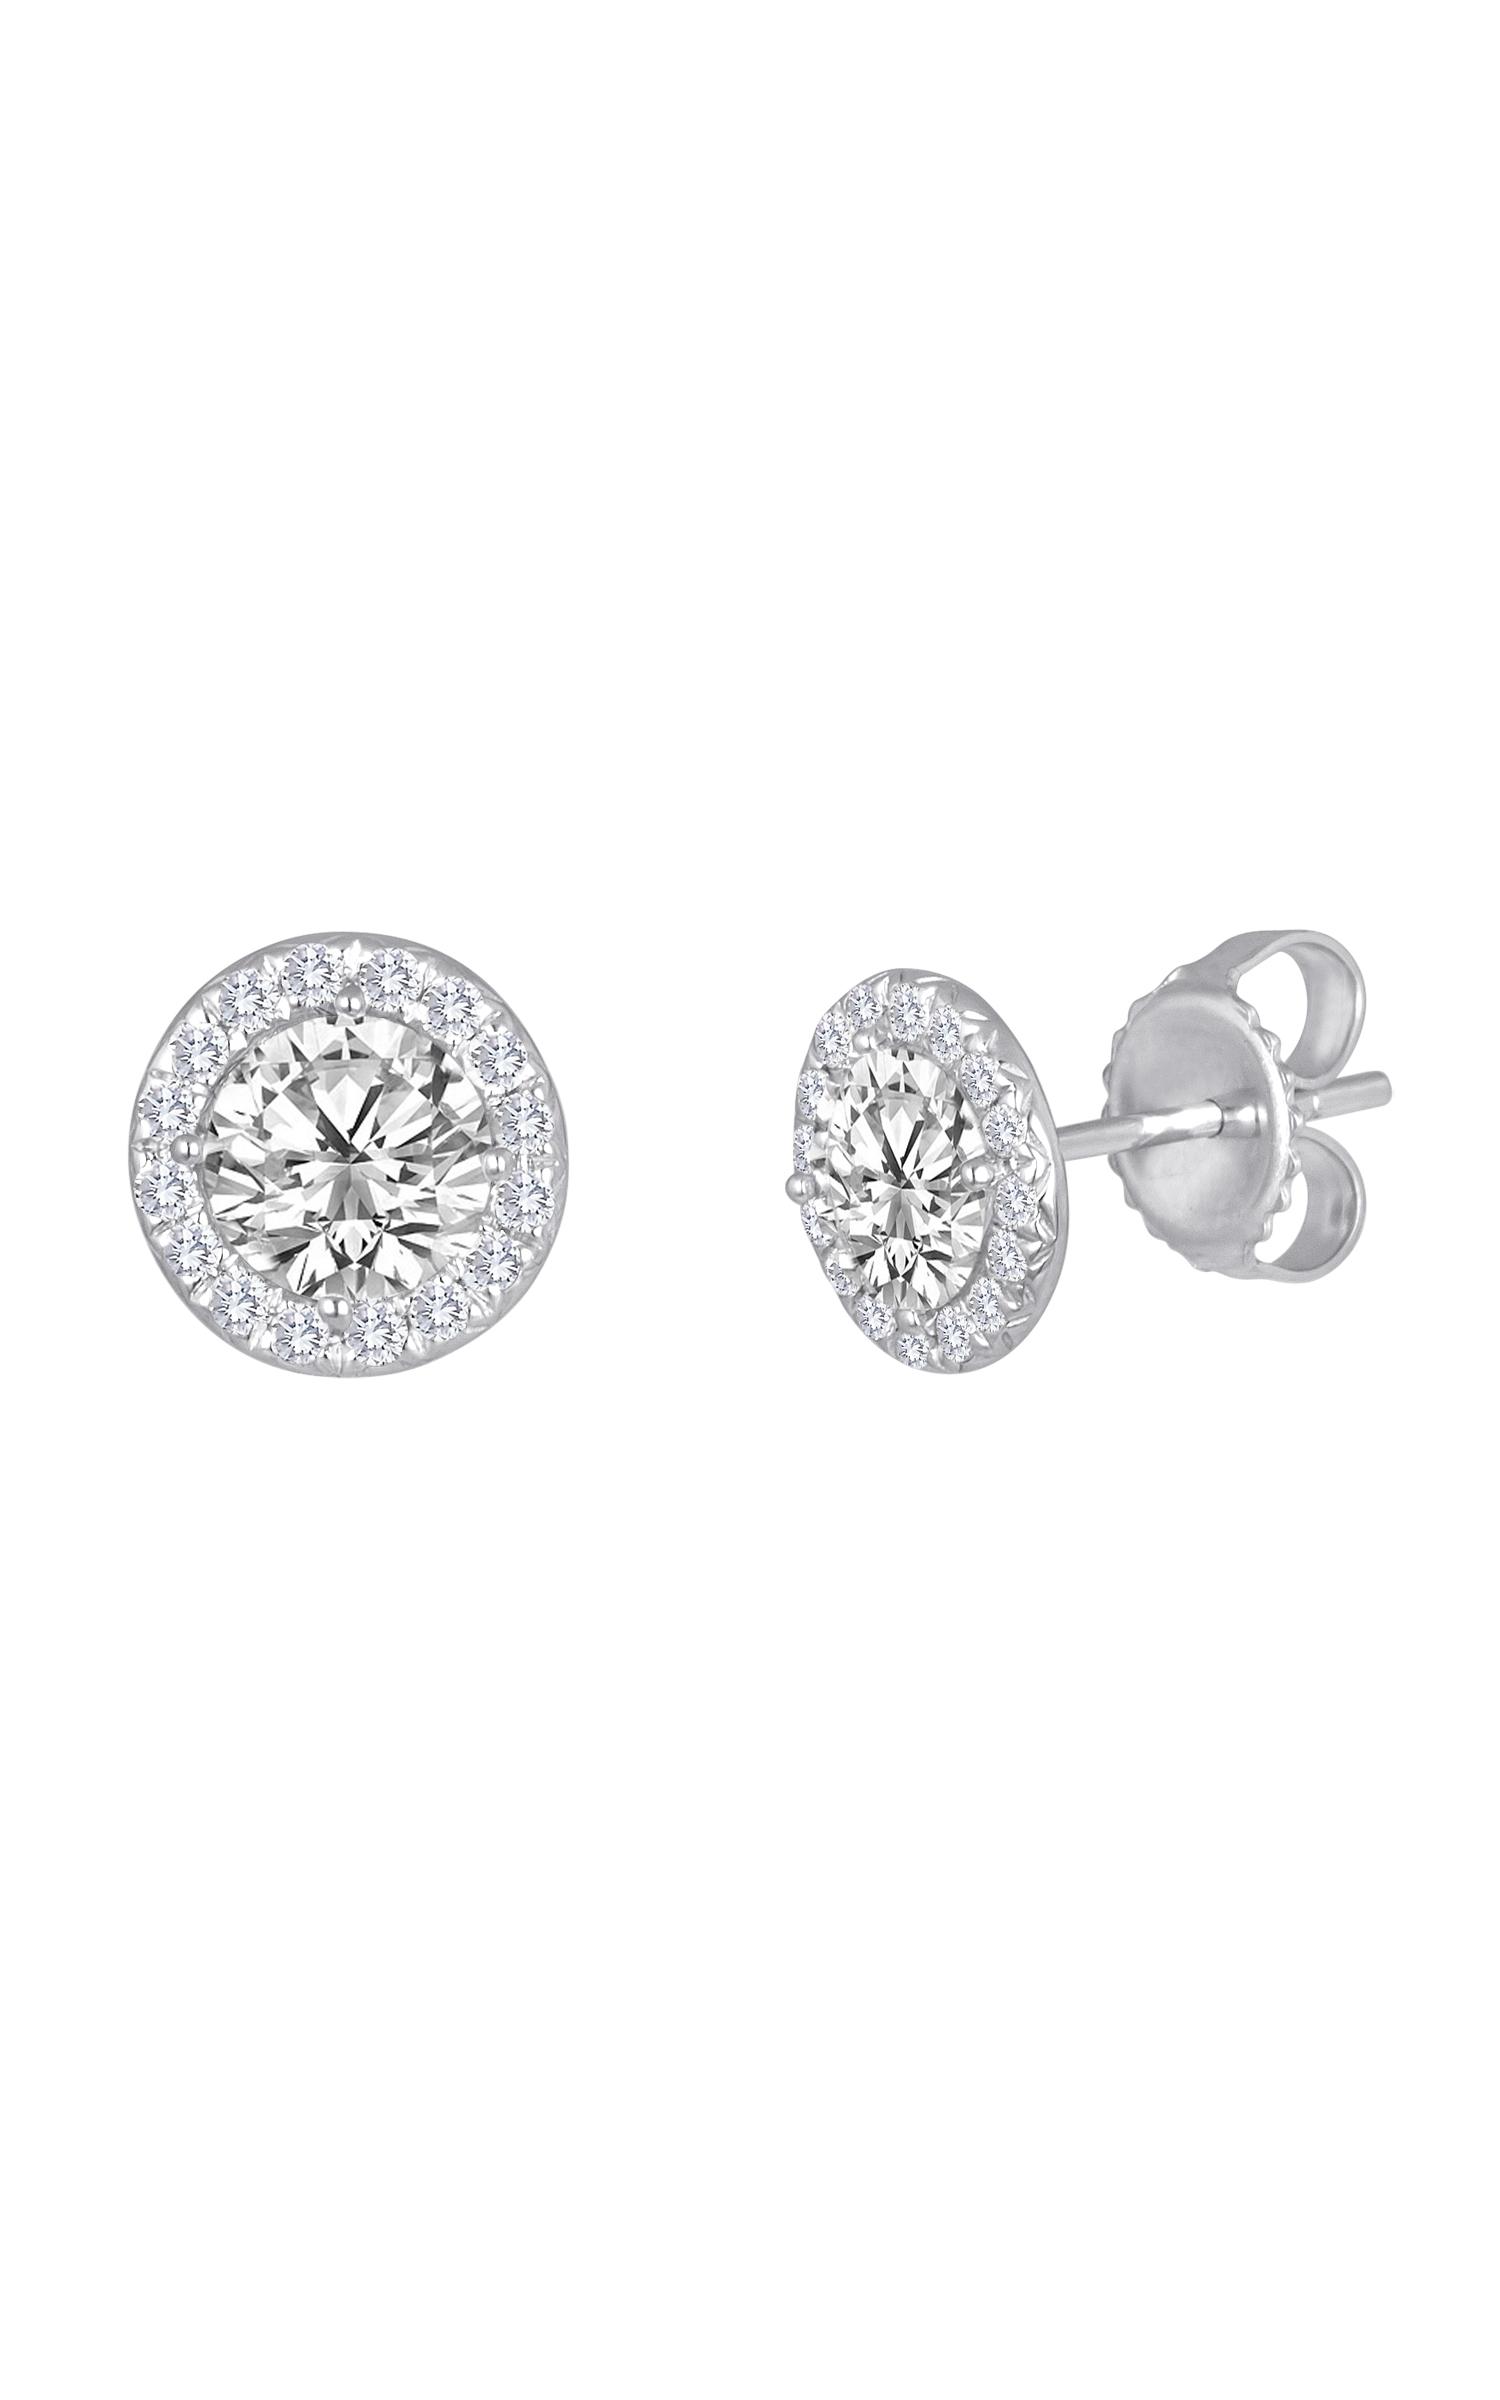 Beny Sofer Earrings SE12-146-2C product image